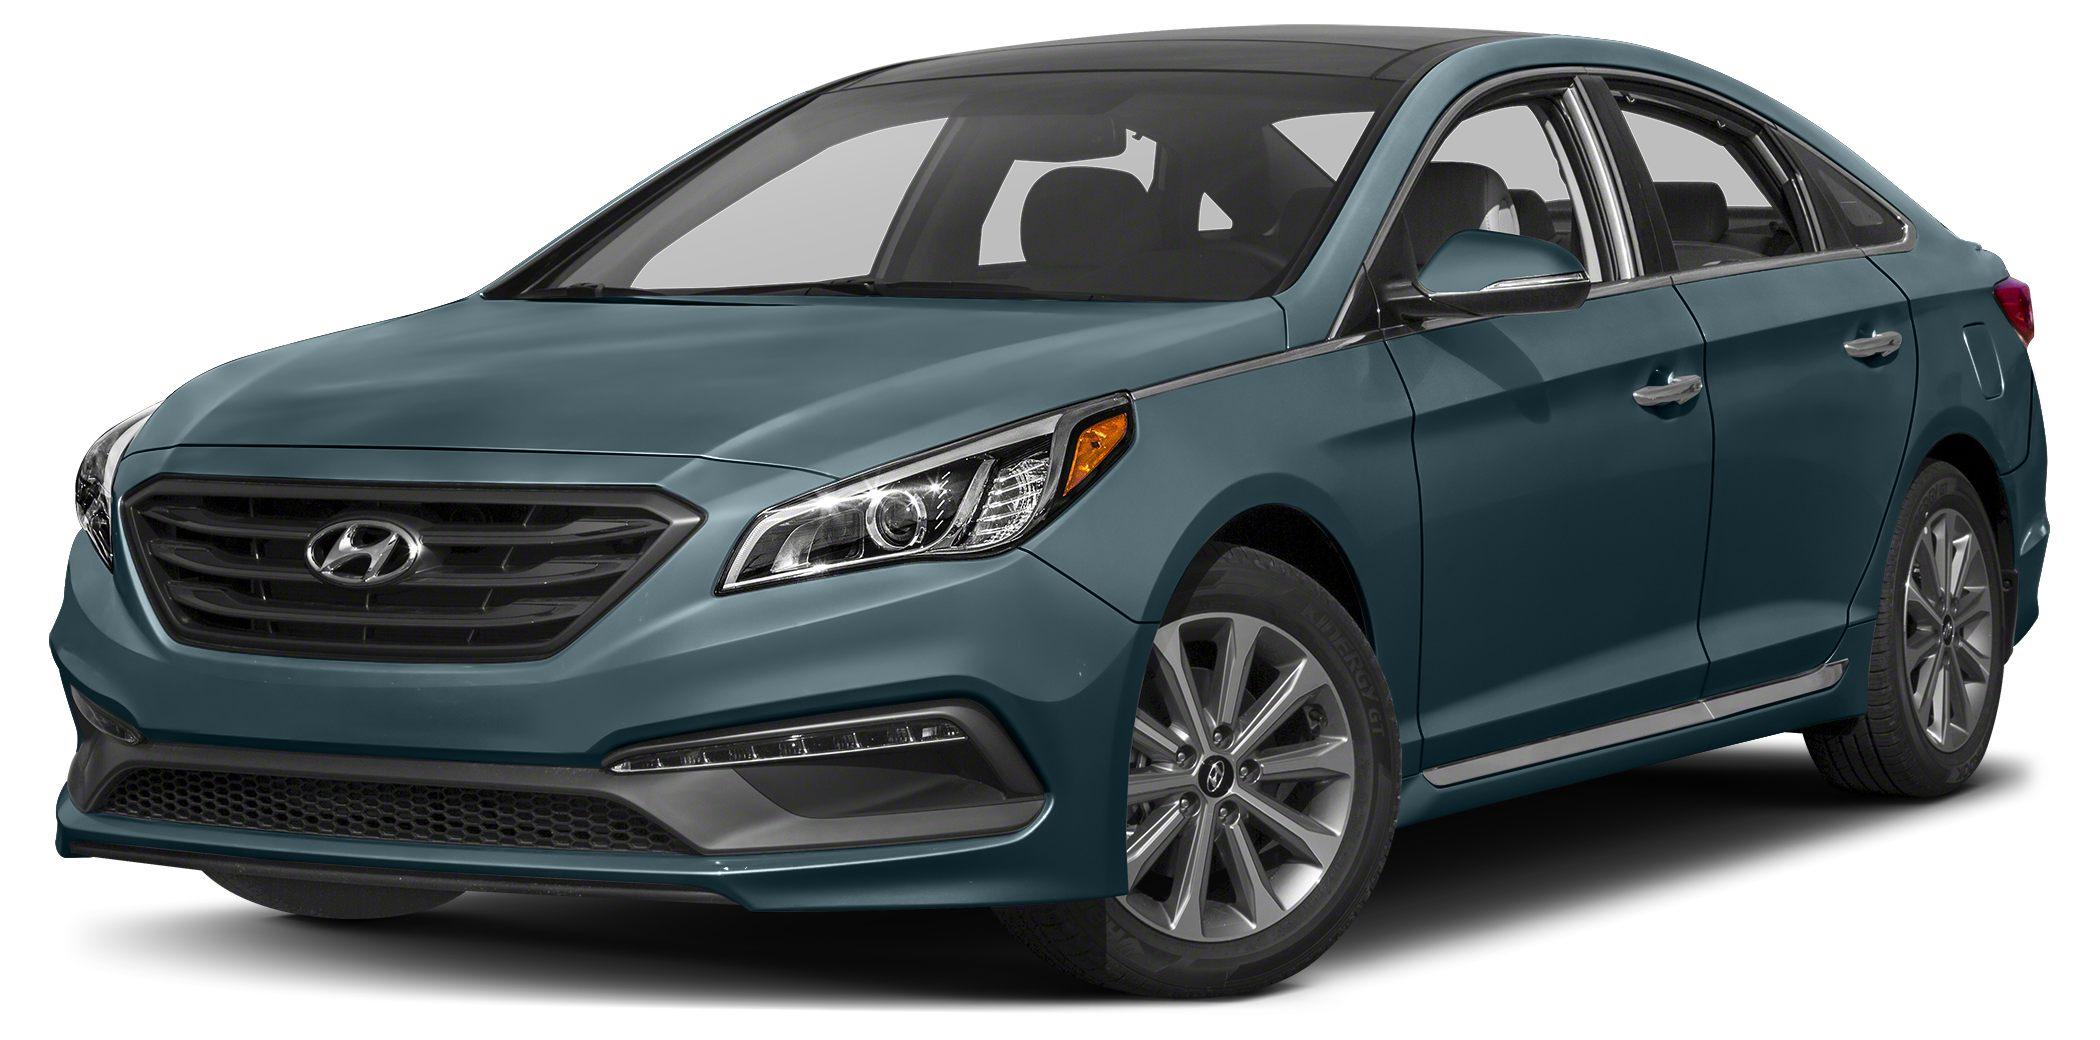 2016 Hyundai Sonata Limited Bluetooth Miles 11Color Nouveau Blue Stock 14640 VIN 5NPE34AFXG